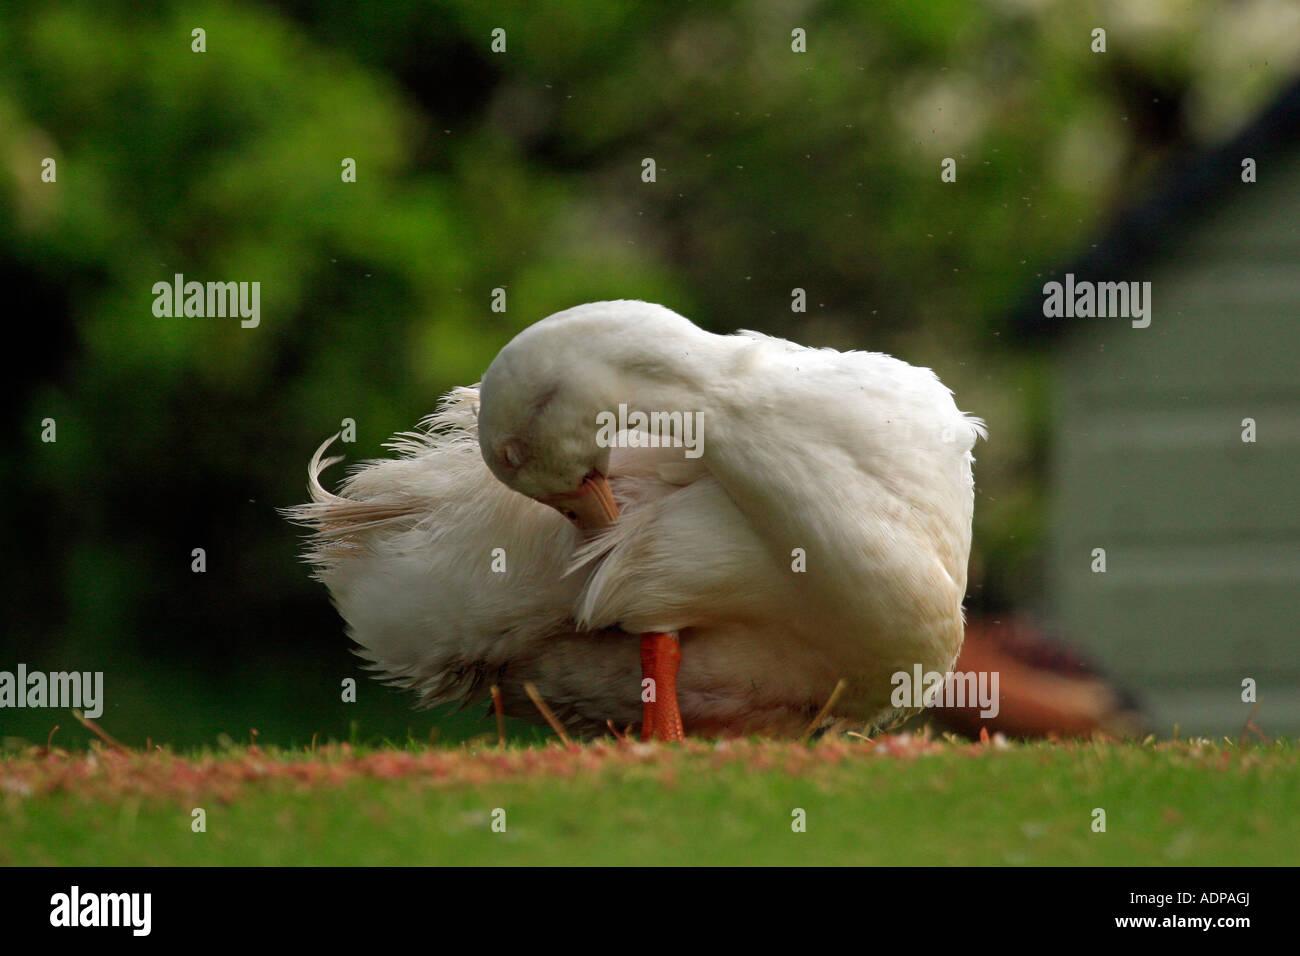 Preening duck. - Stock Image